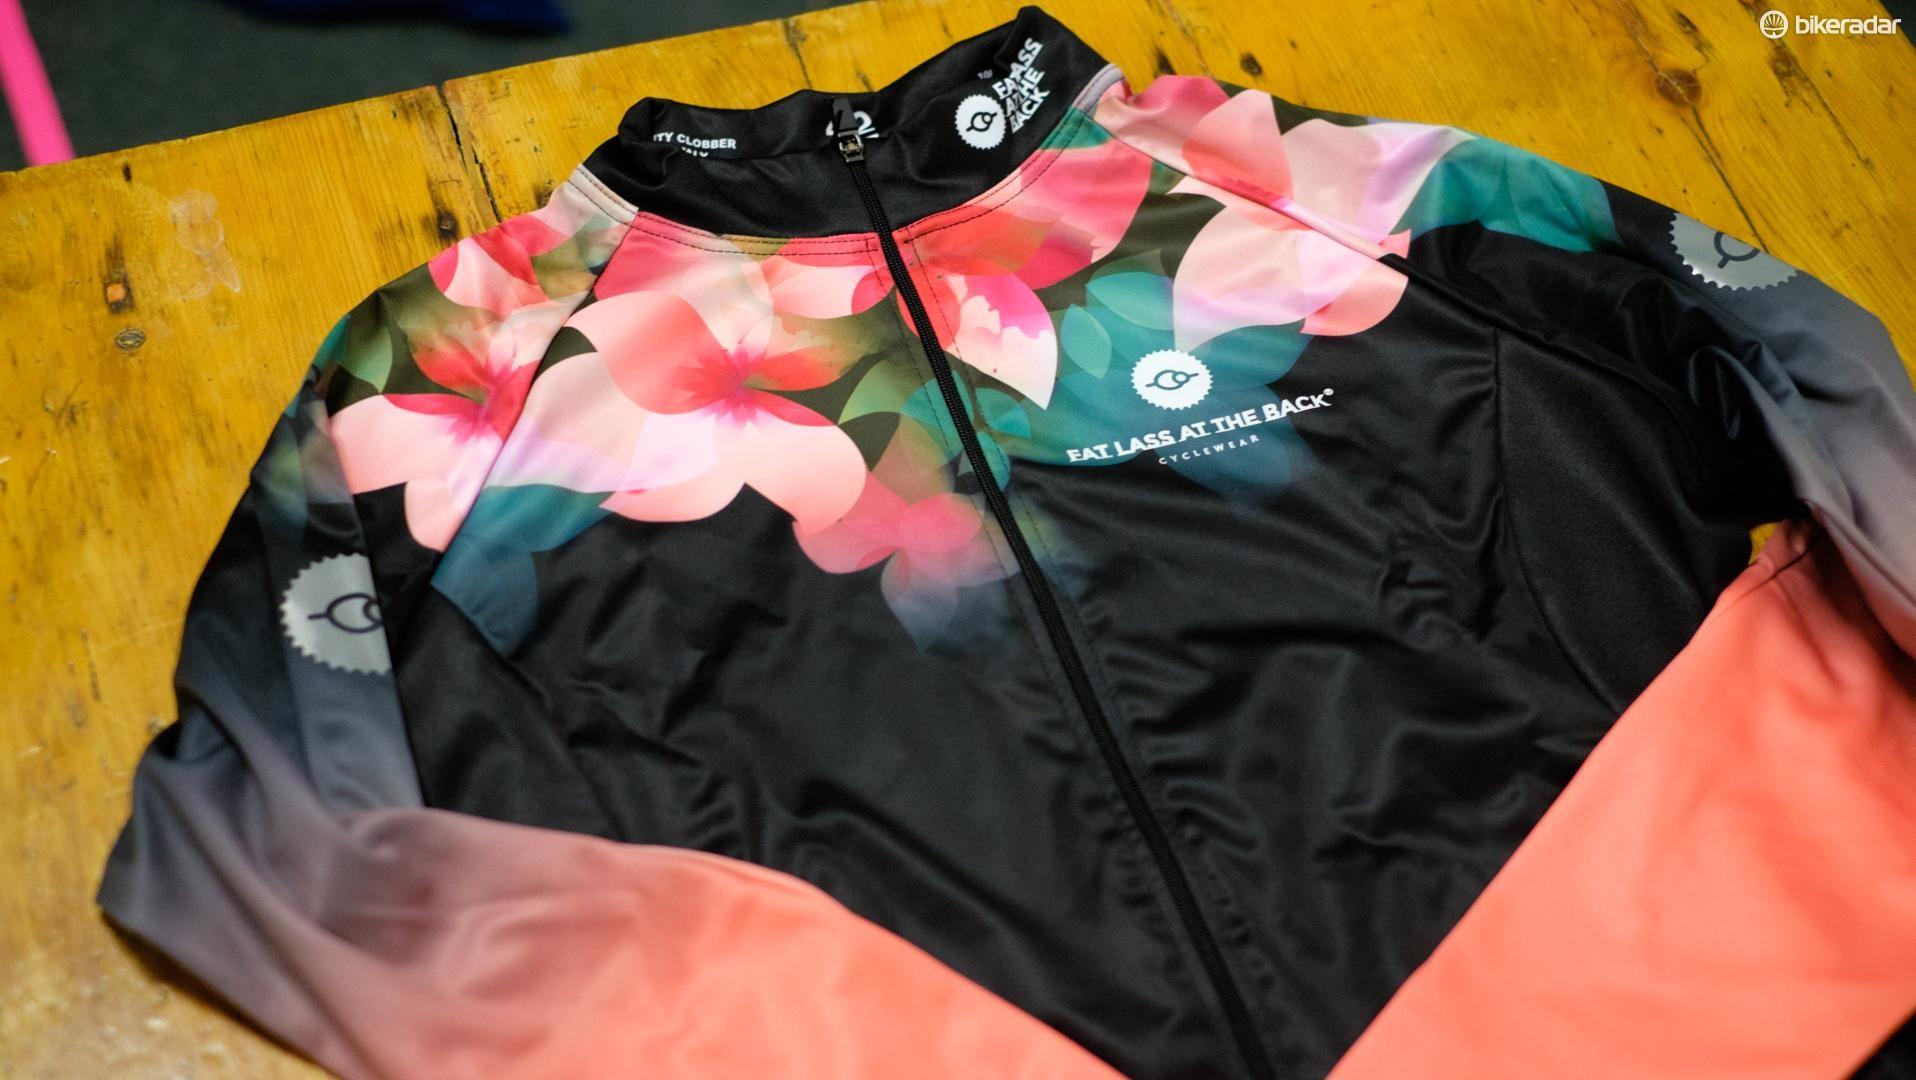 Bright kit for women too